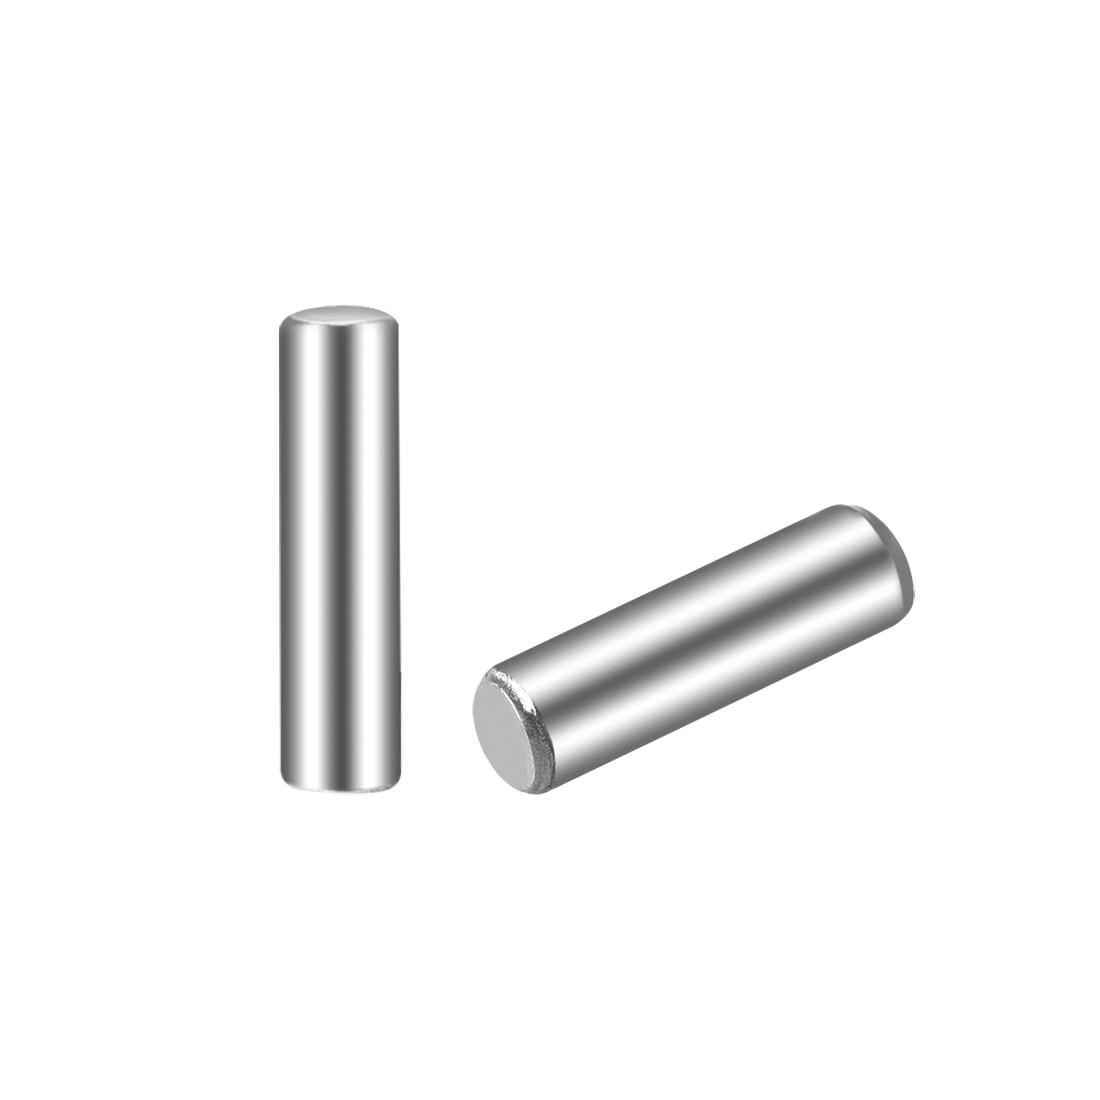 25Pcs 2.5mm x 10mm Dowel Pin 304 Stainless Steel Shelf Support Pin Fasten